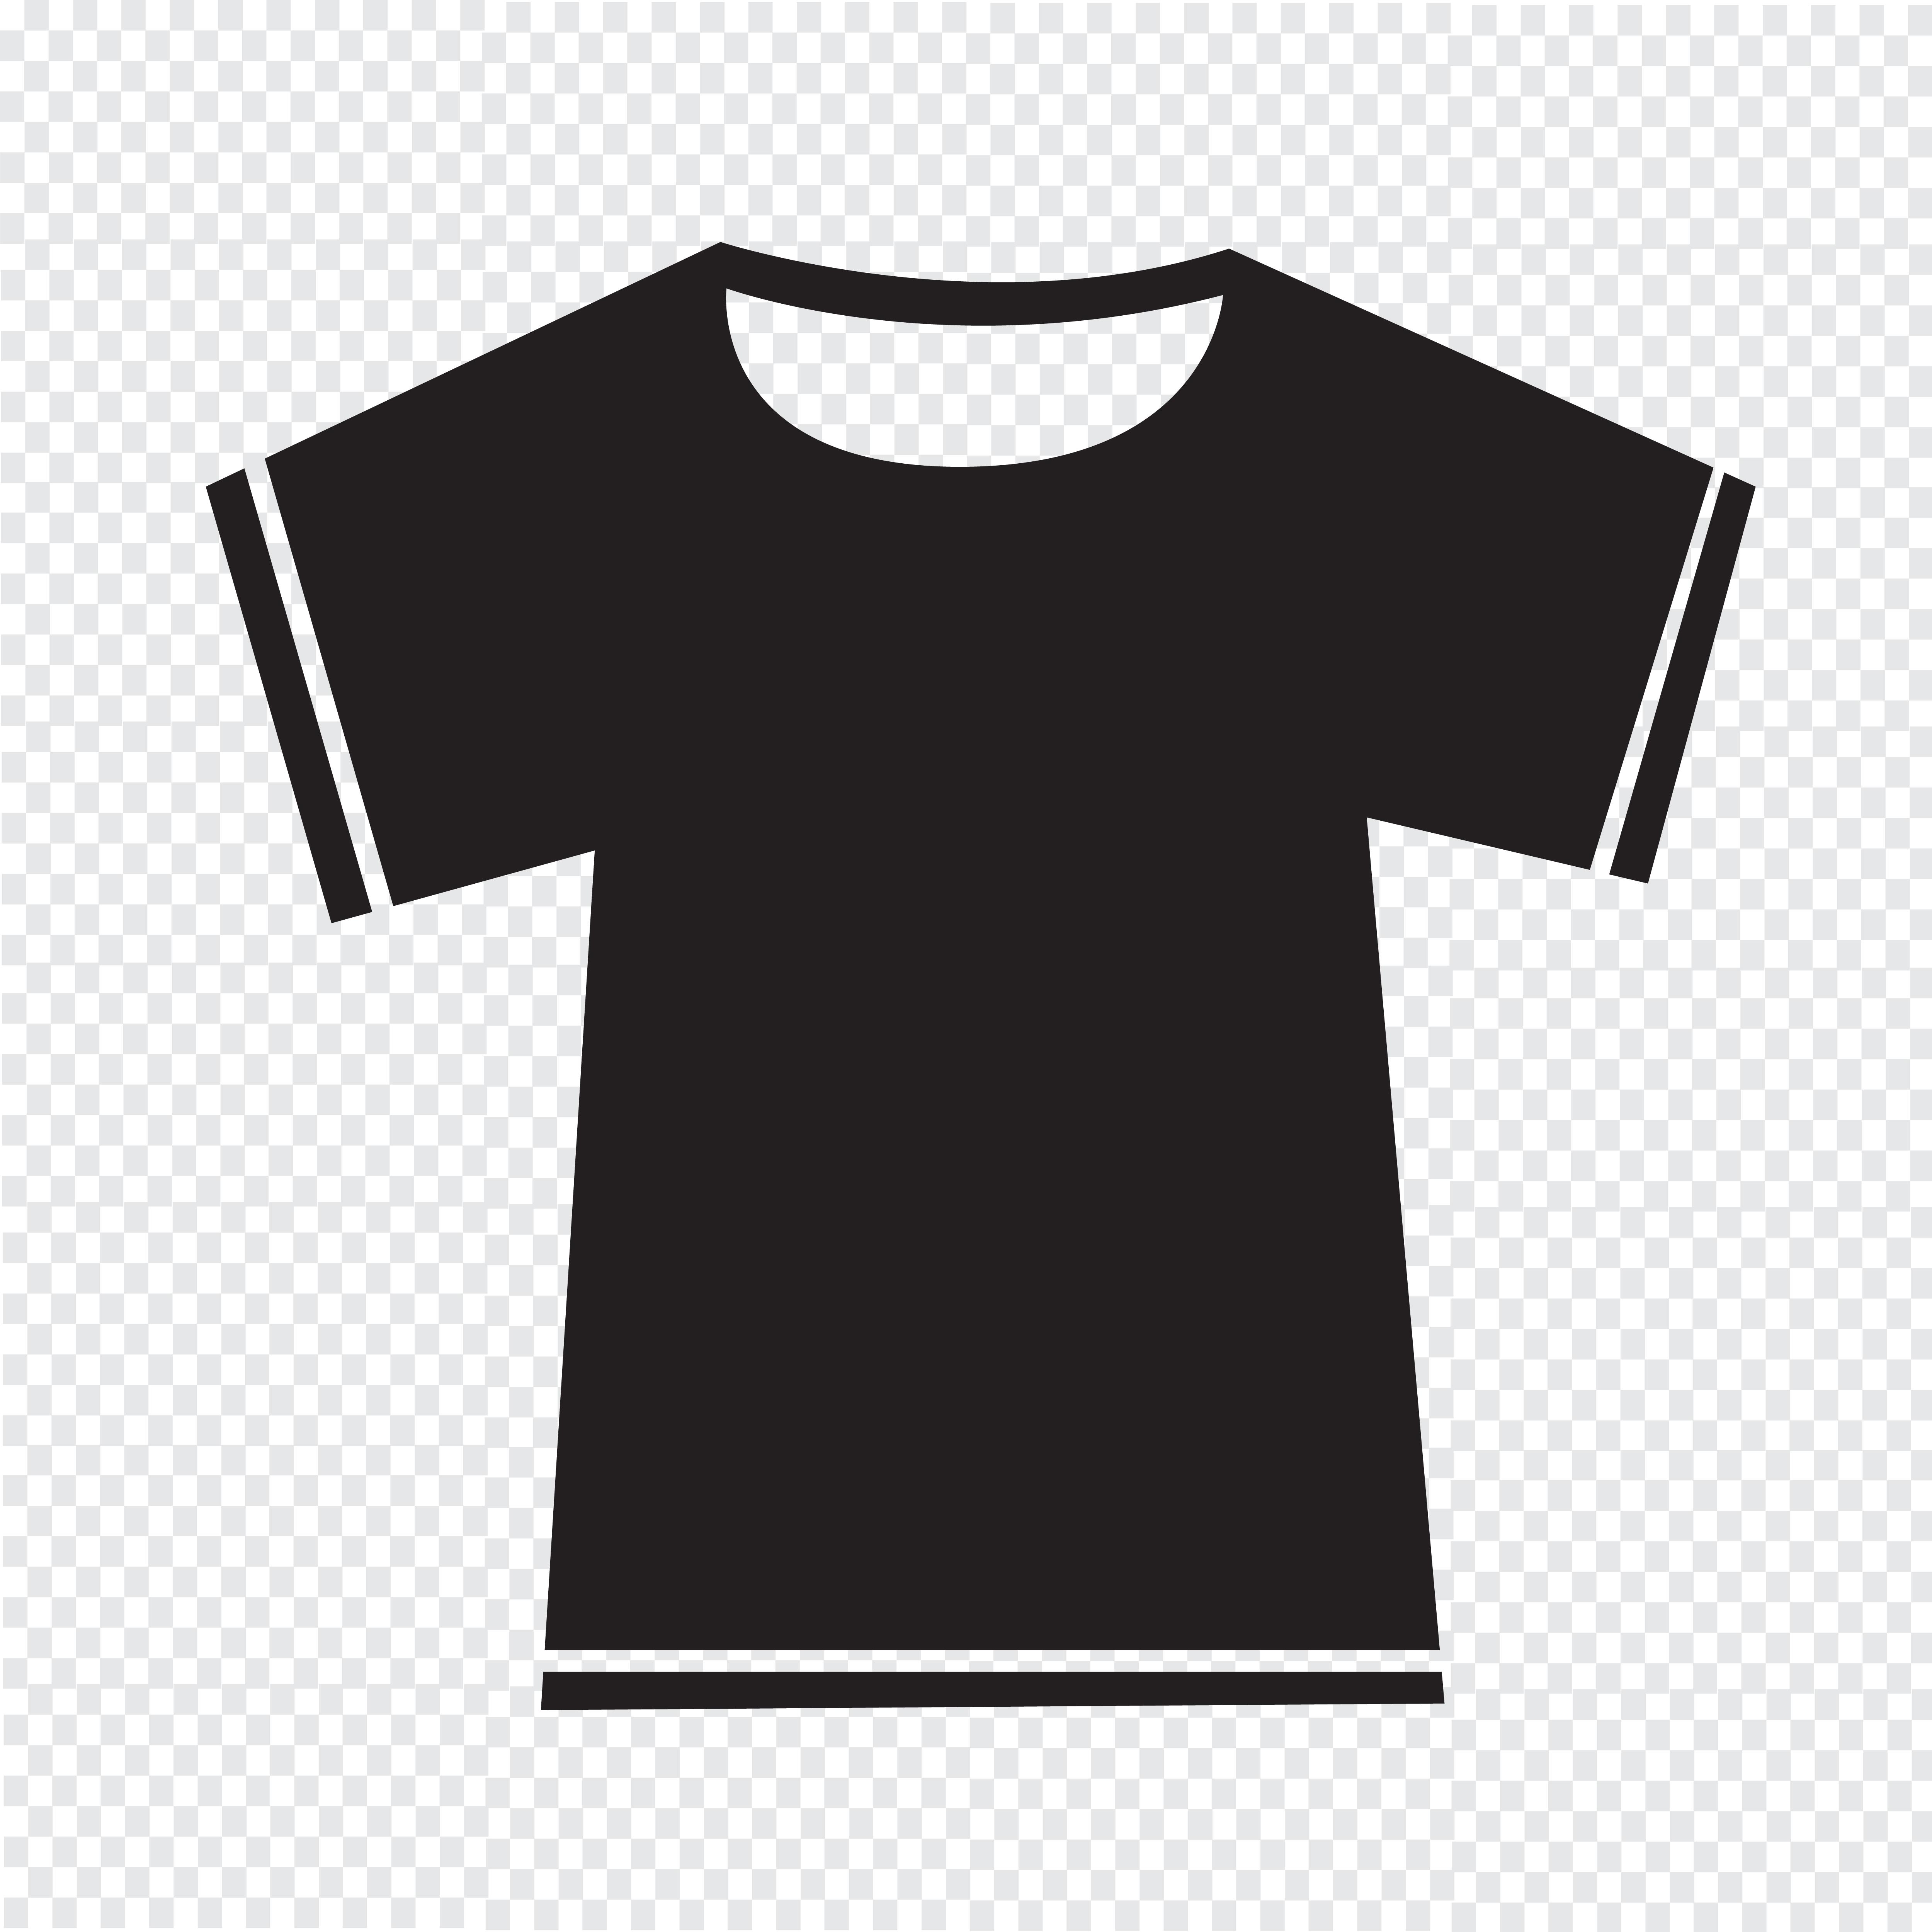 tshirt icon symbol sign download free vectors clipart graphics vector art tshirt icon symbol sign download free vectors clipart graphics vector art